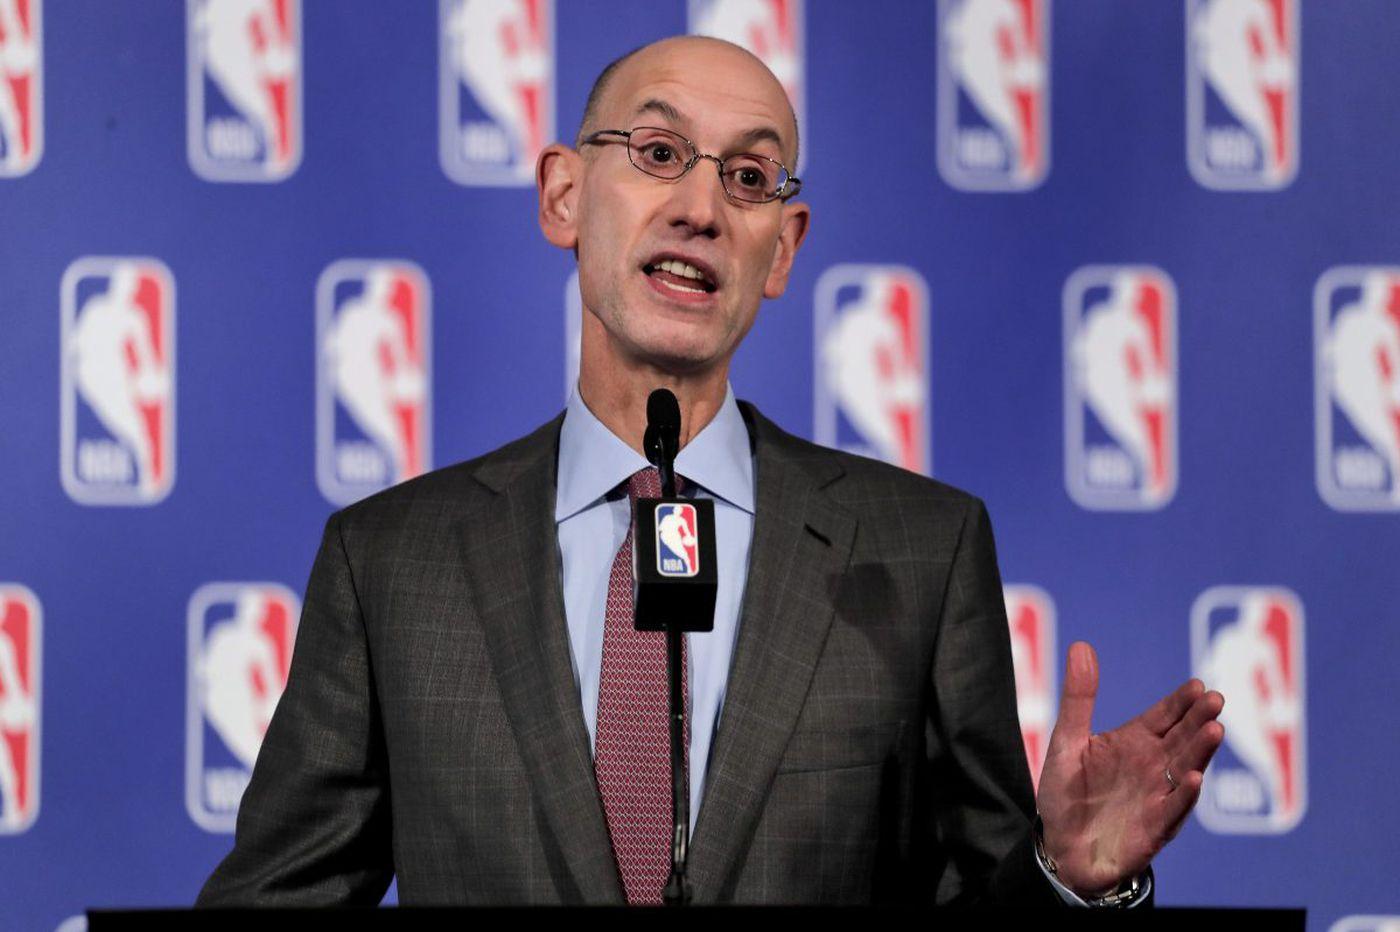 The future of NBA statistics and analytics